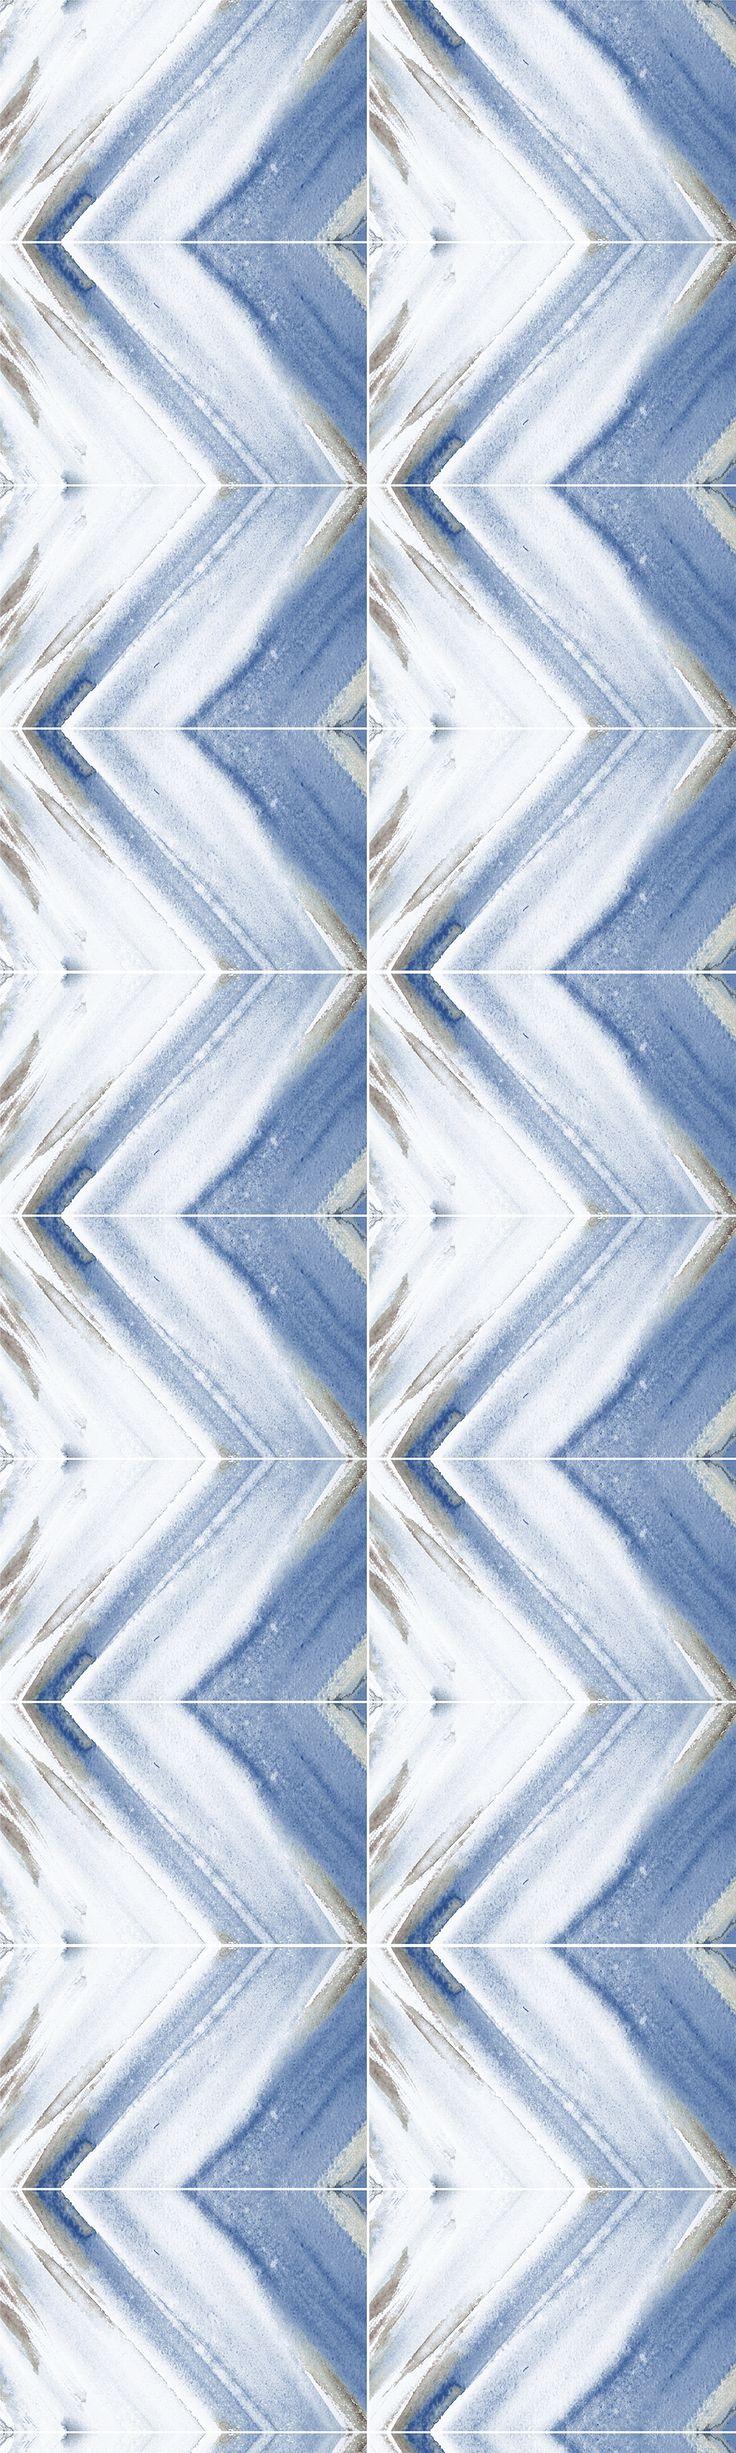 1000 ideas about zig zag wallpaper on pinterest zig zag